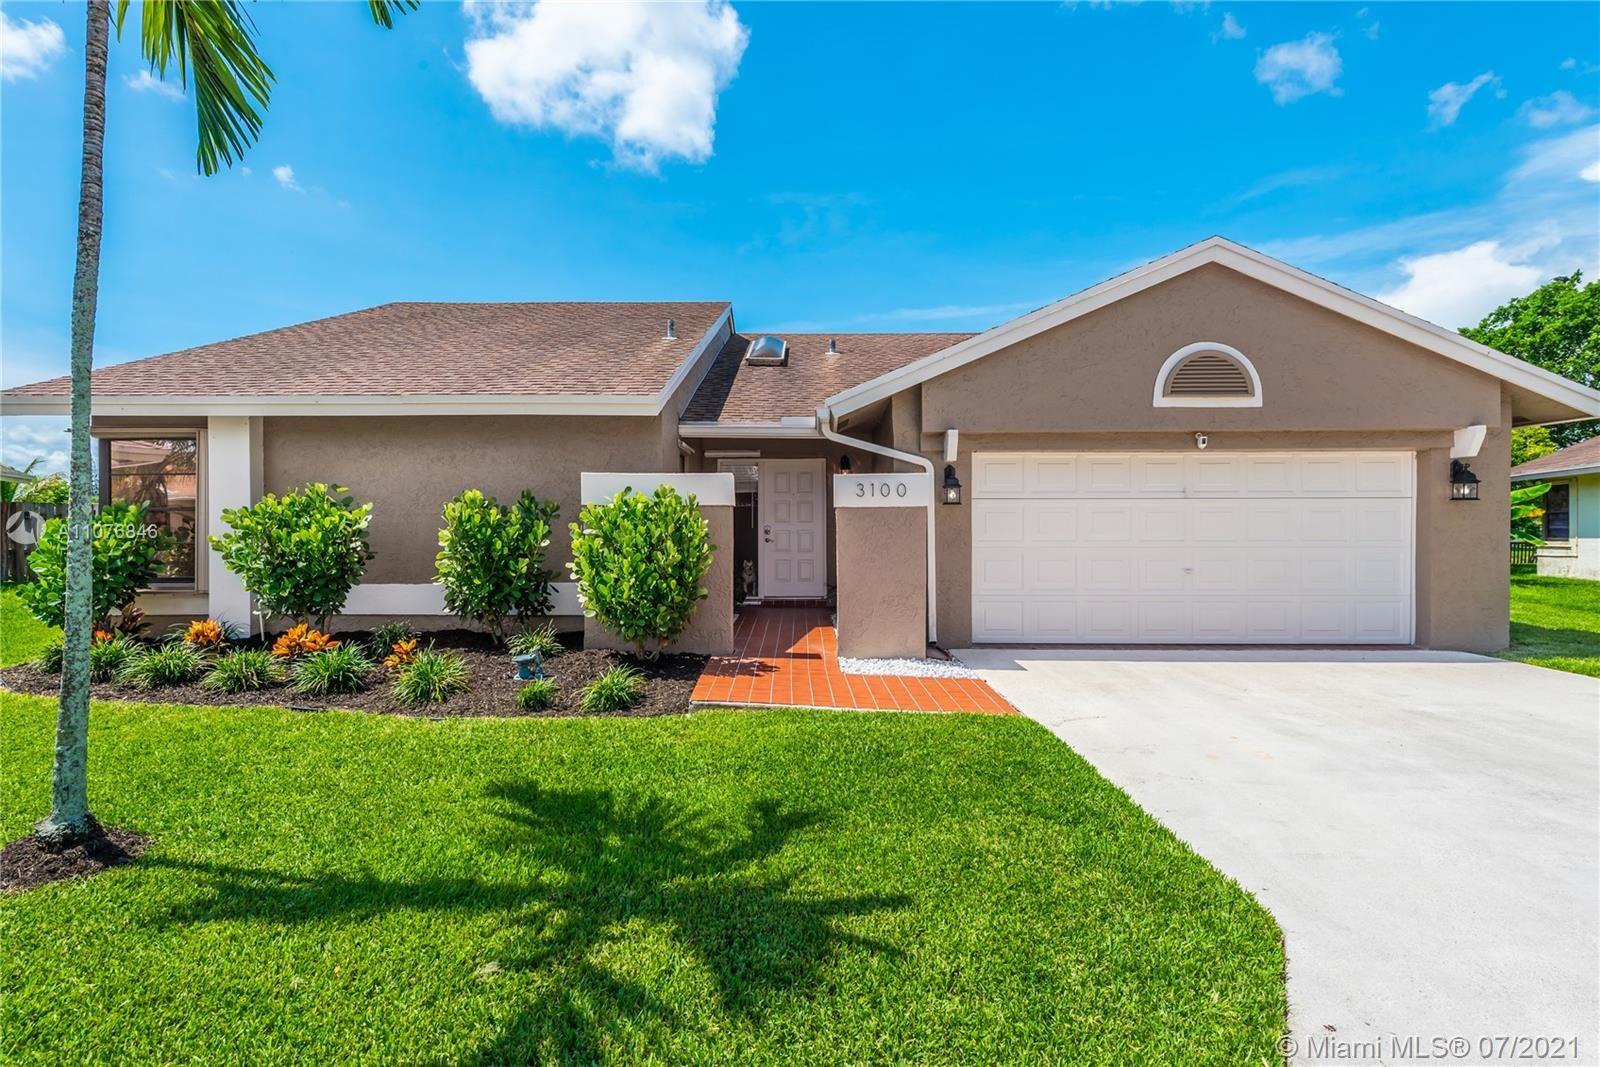 3100 NW 109th Ave, Sunrise, FL 33351 - #: A11076846